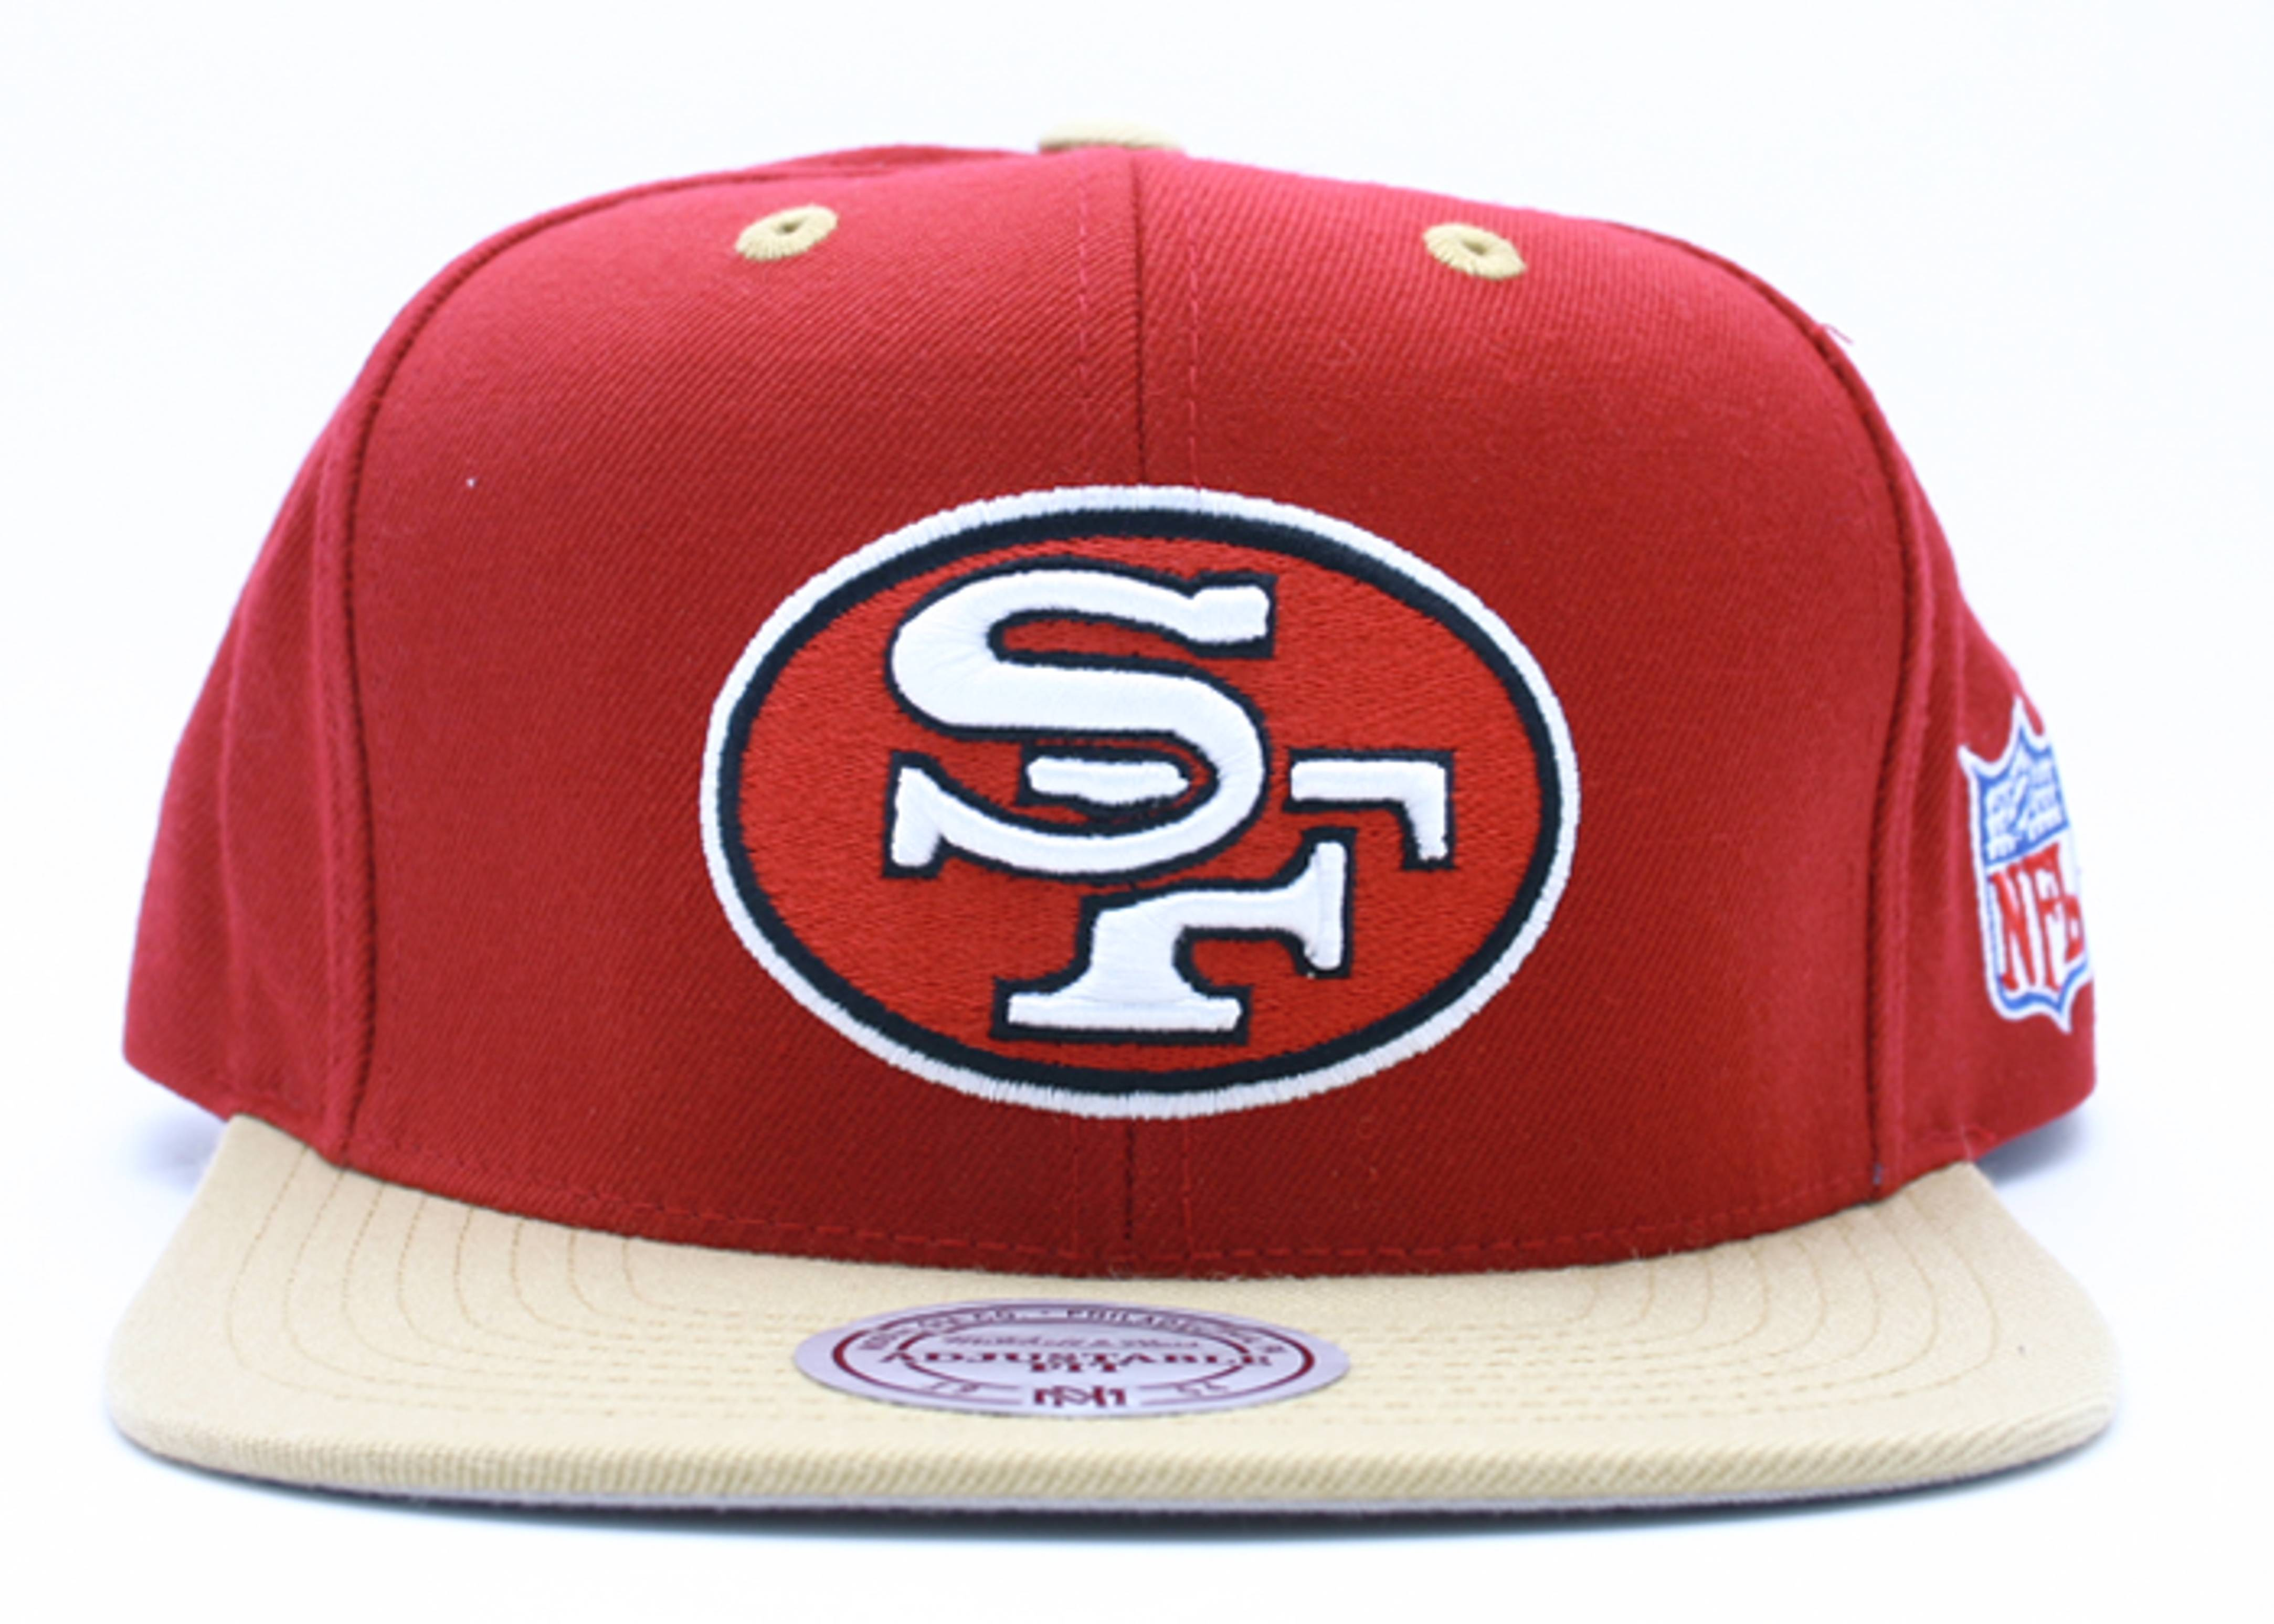 san francisco 49ers snap-back